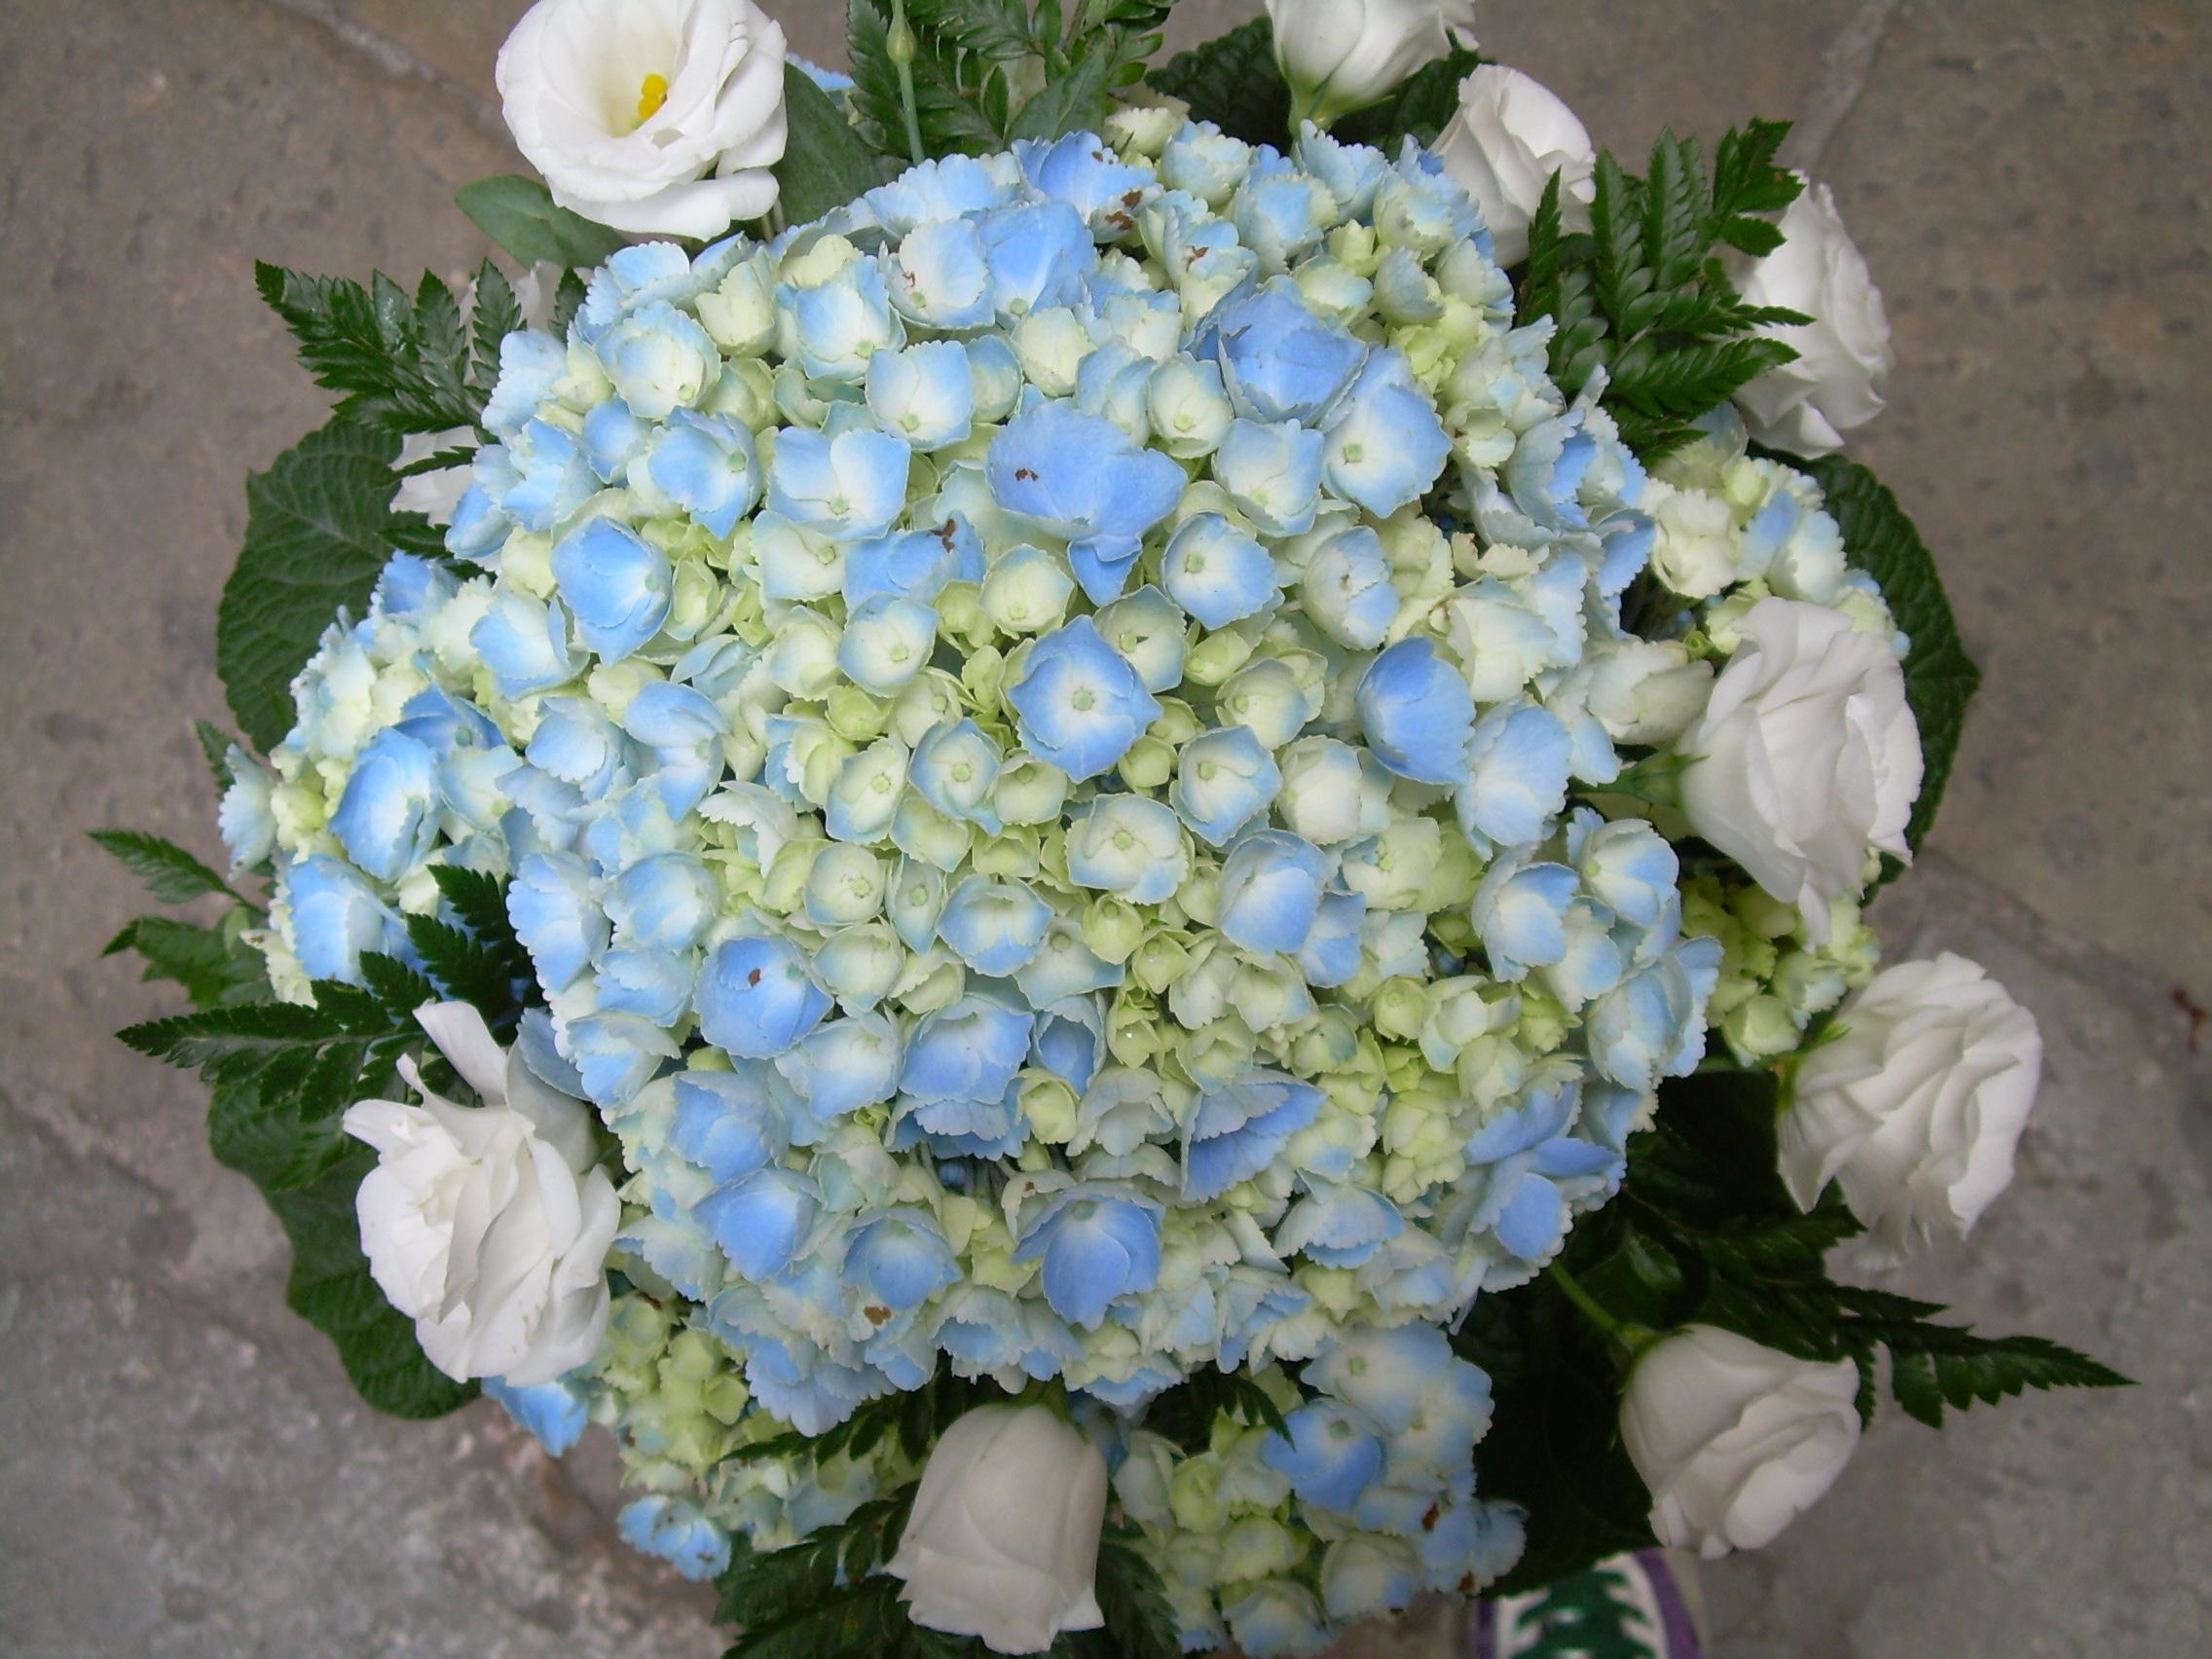 Ortensie Blu : Elisabetta fiori e piante centrotavola con ortensie blu